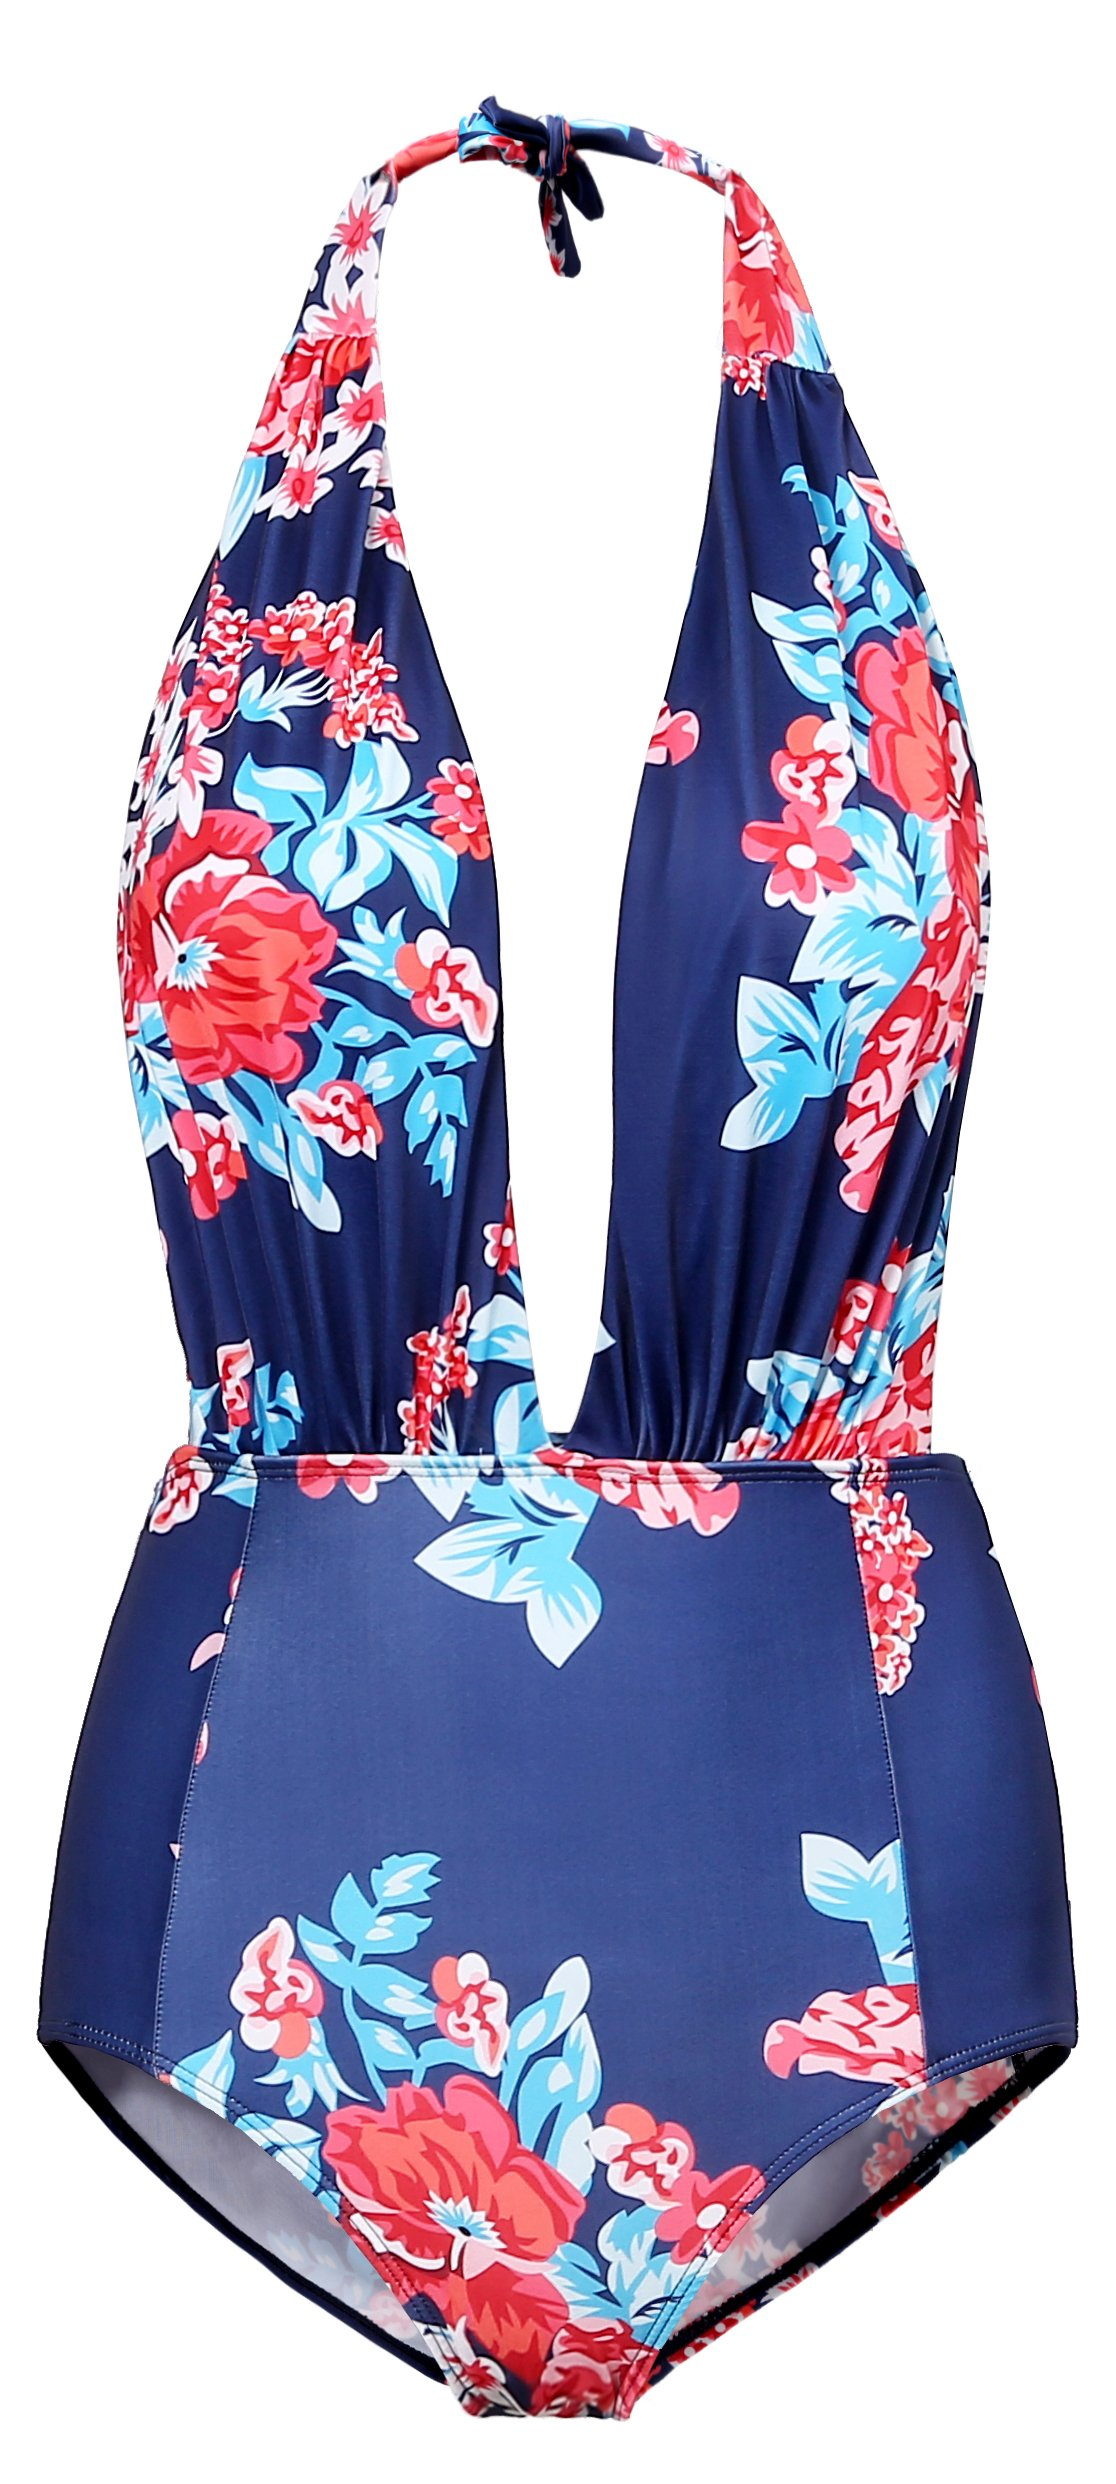 BESUMA One Piece Backless Bikini Bather Swimsuit High Waisted Pin Up Swimwear ((US 8-10) L, Blue)